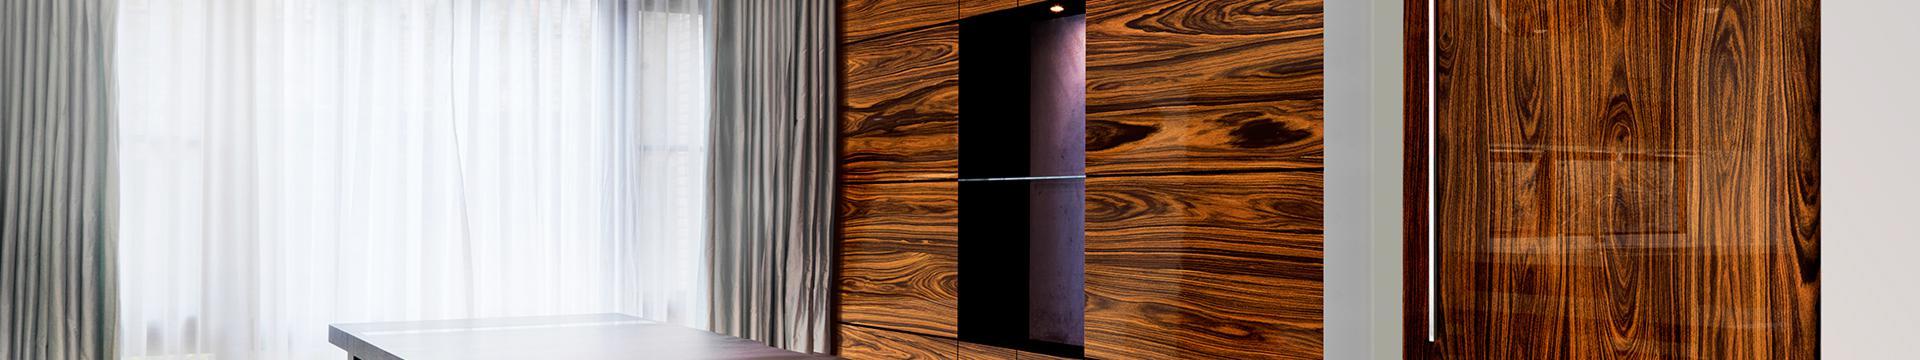 2017 - Vicaima Interior Doors & Vicaima Doors Suppliers \u0026 Vicaima - Fire Doors